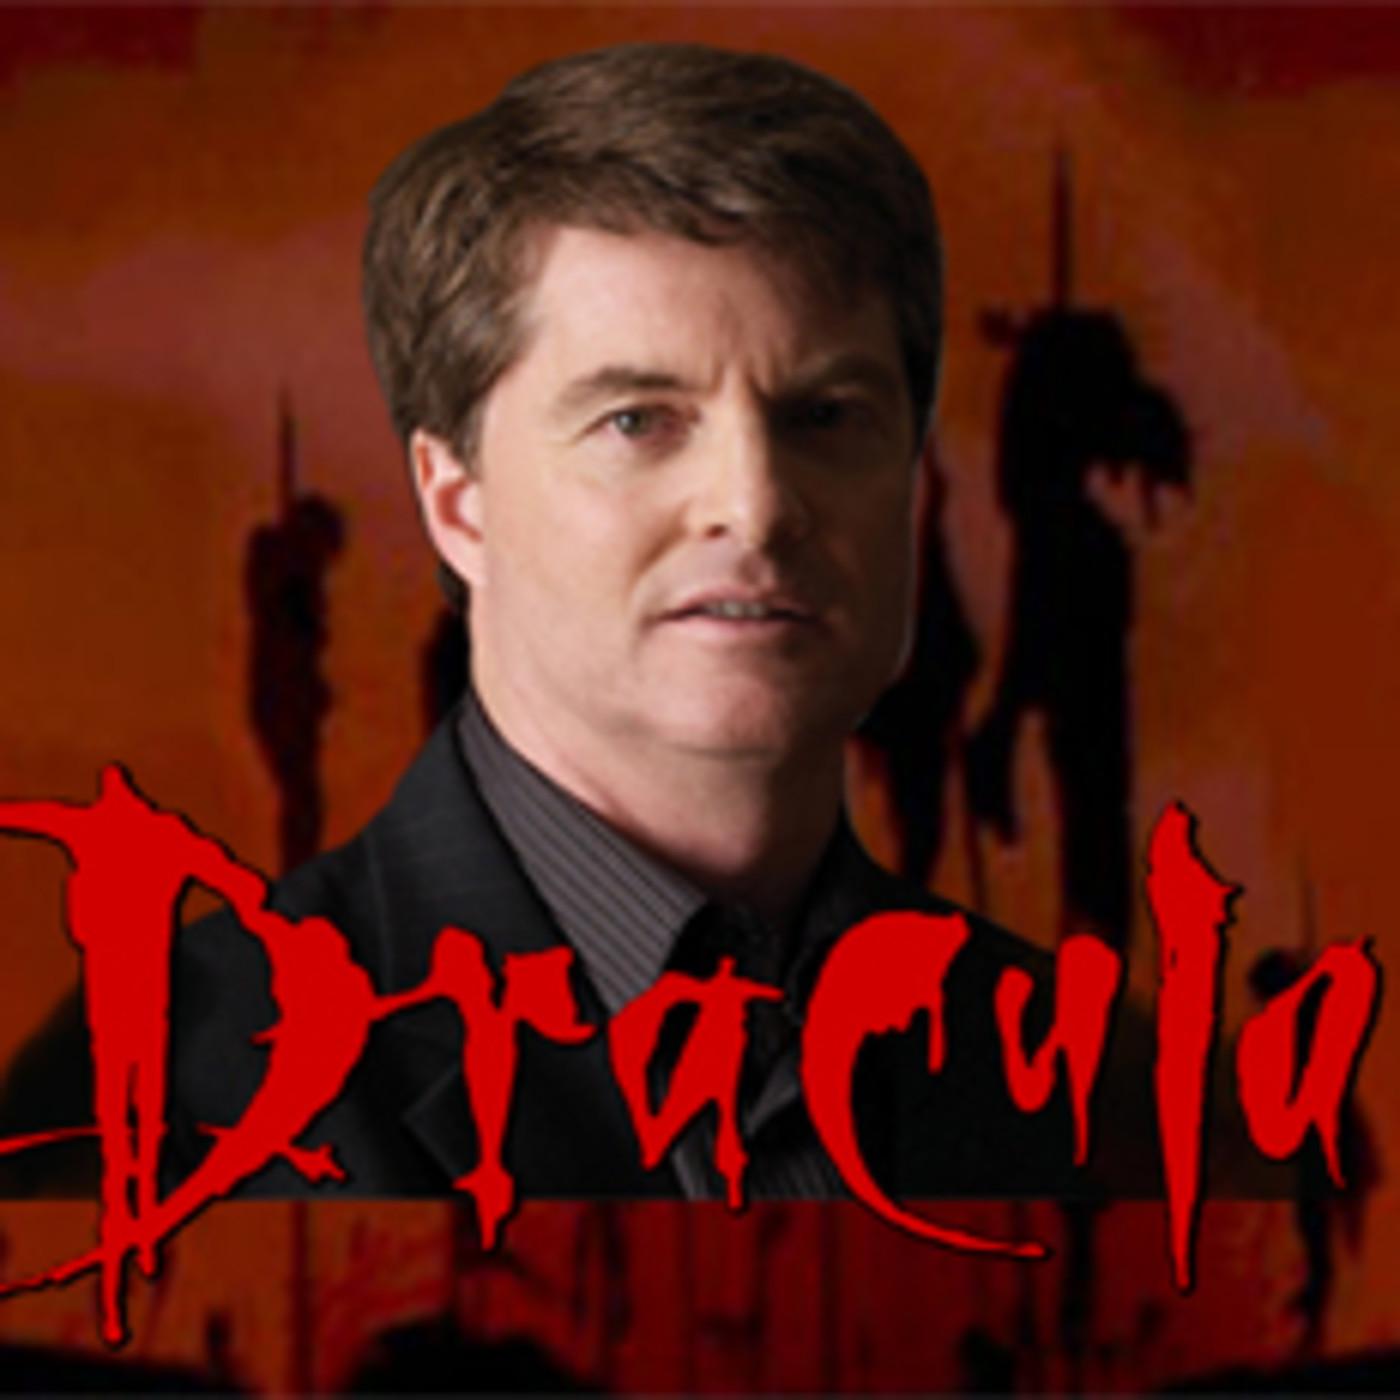 Drácula - Con Dacre Stoker y Javier Arries